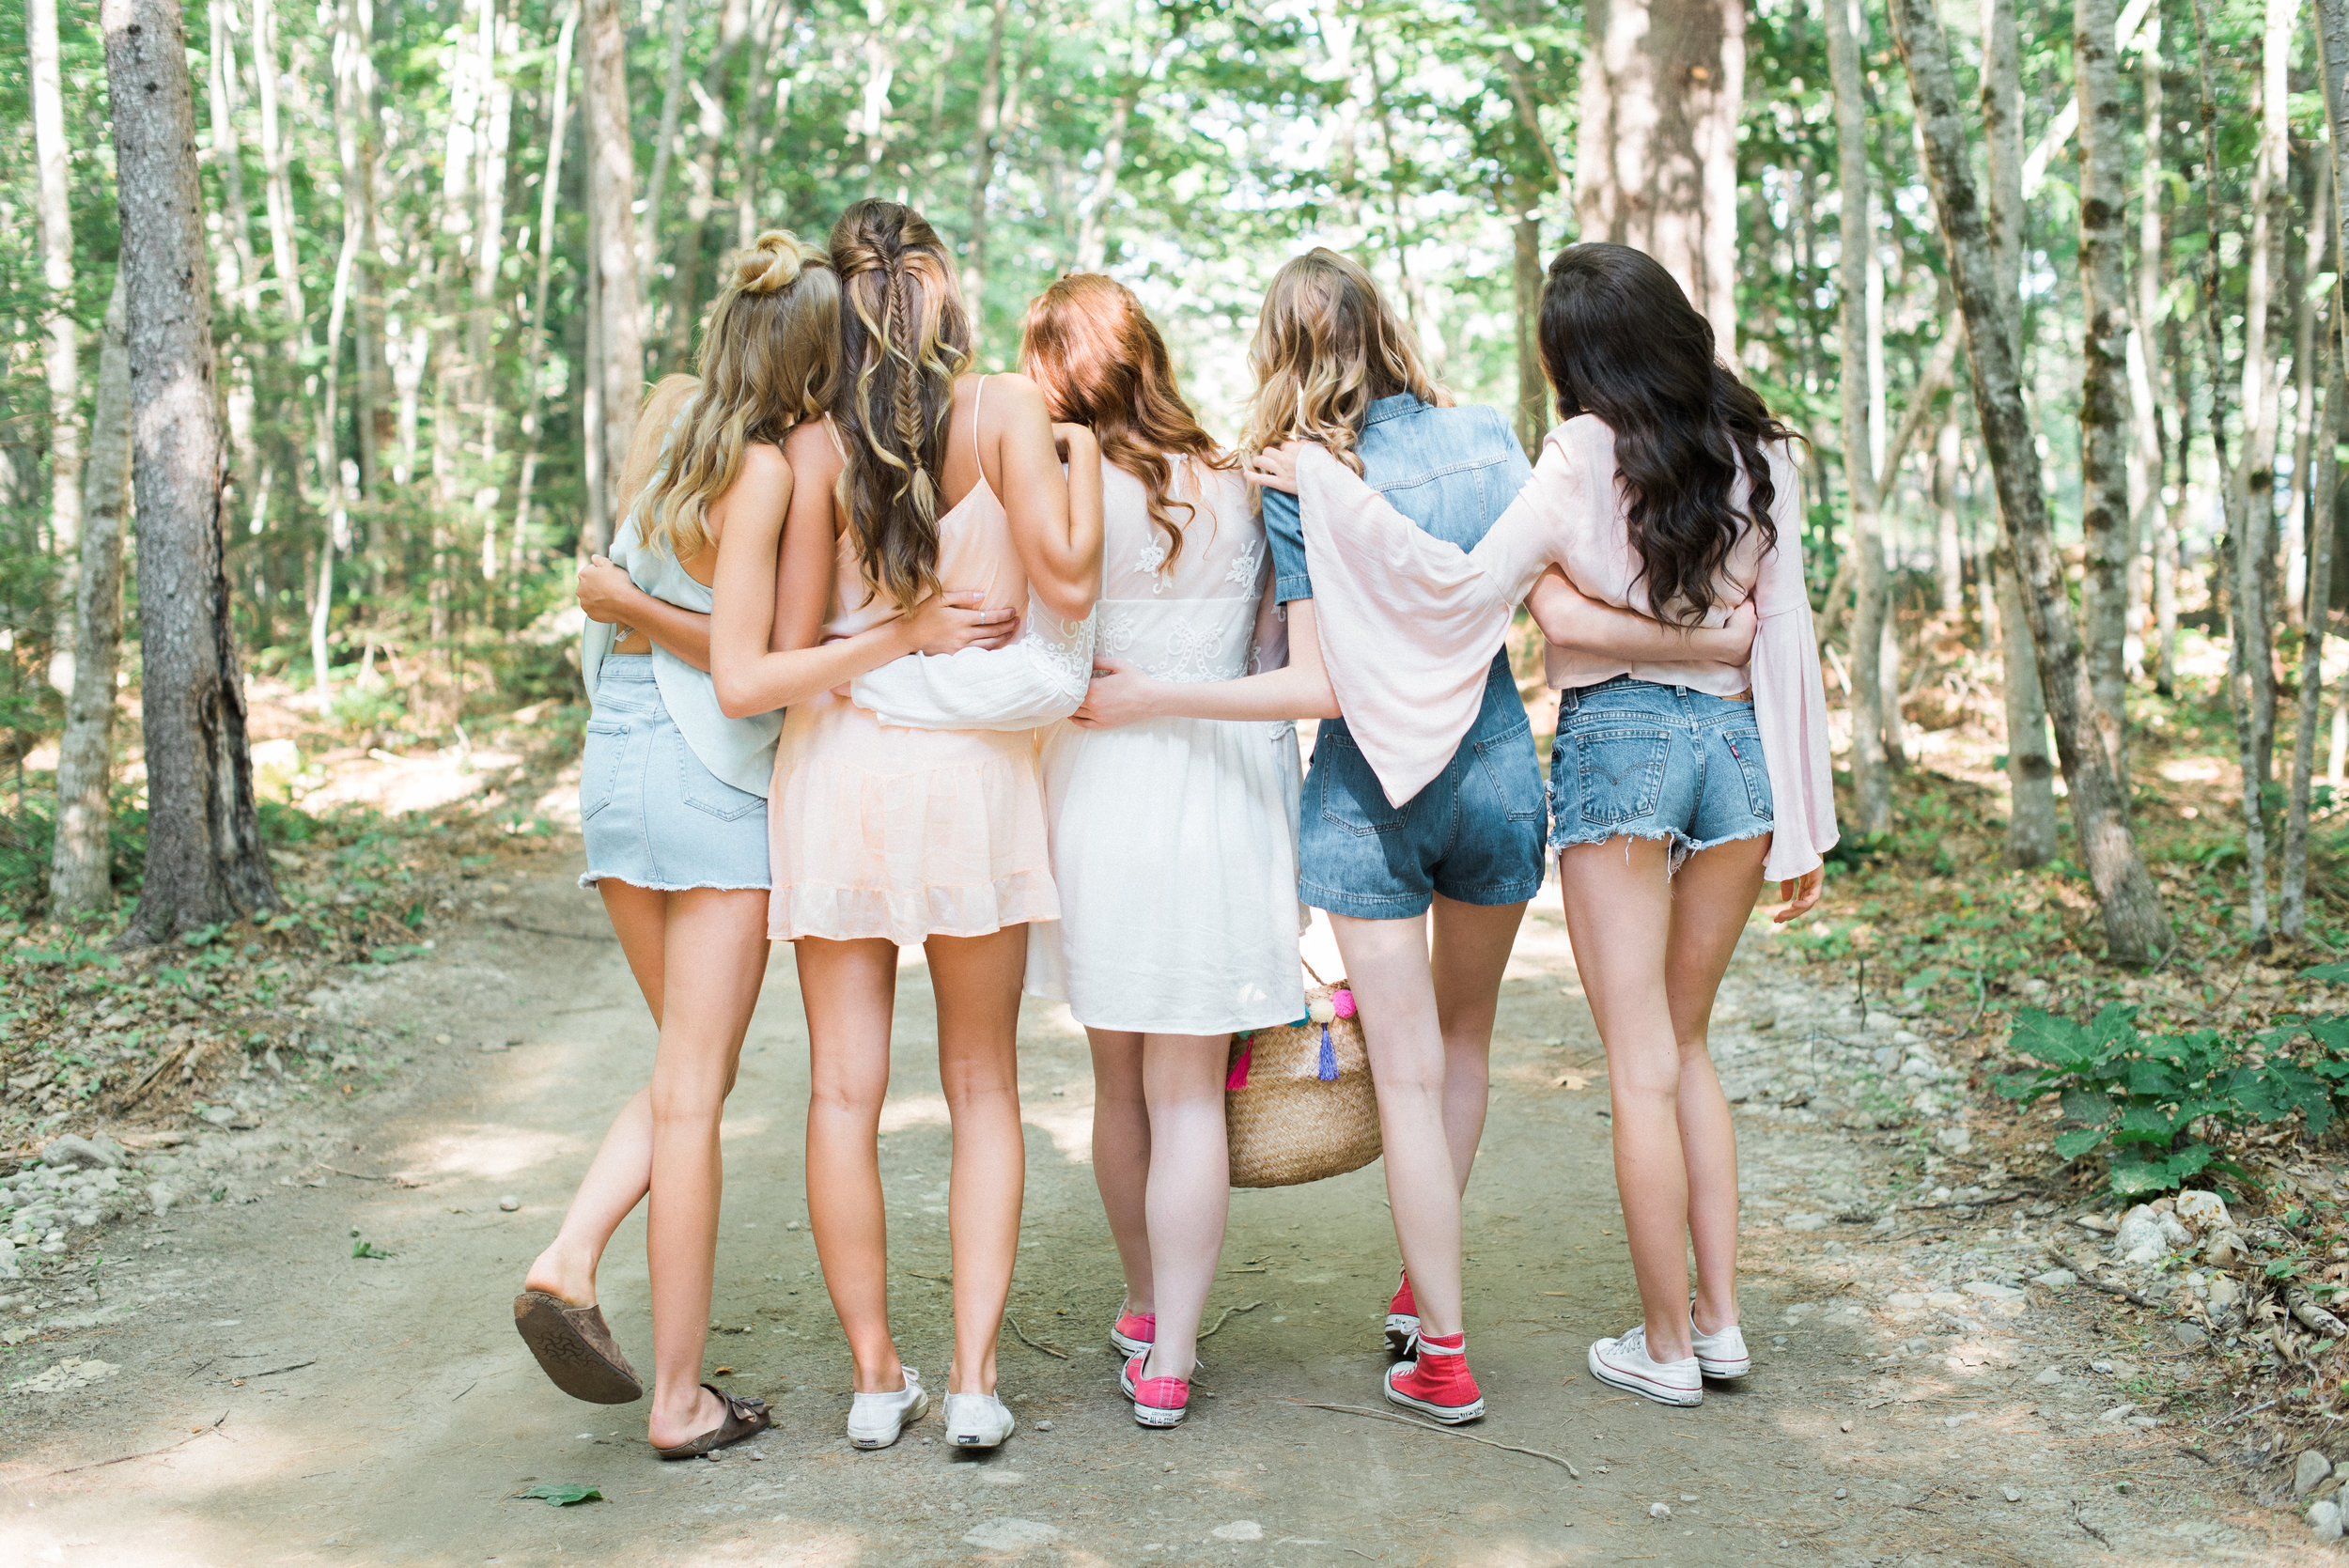 Unique Bachelorette Party Ideas - Glamping Bachelorette Party -- Wedding Inspiration - The Overwhelmed Bride